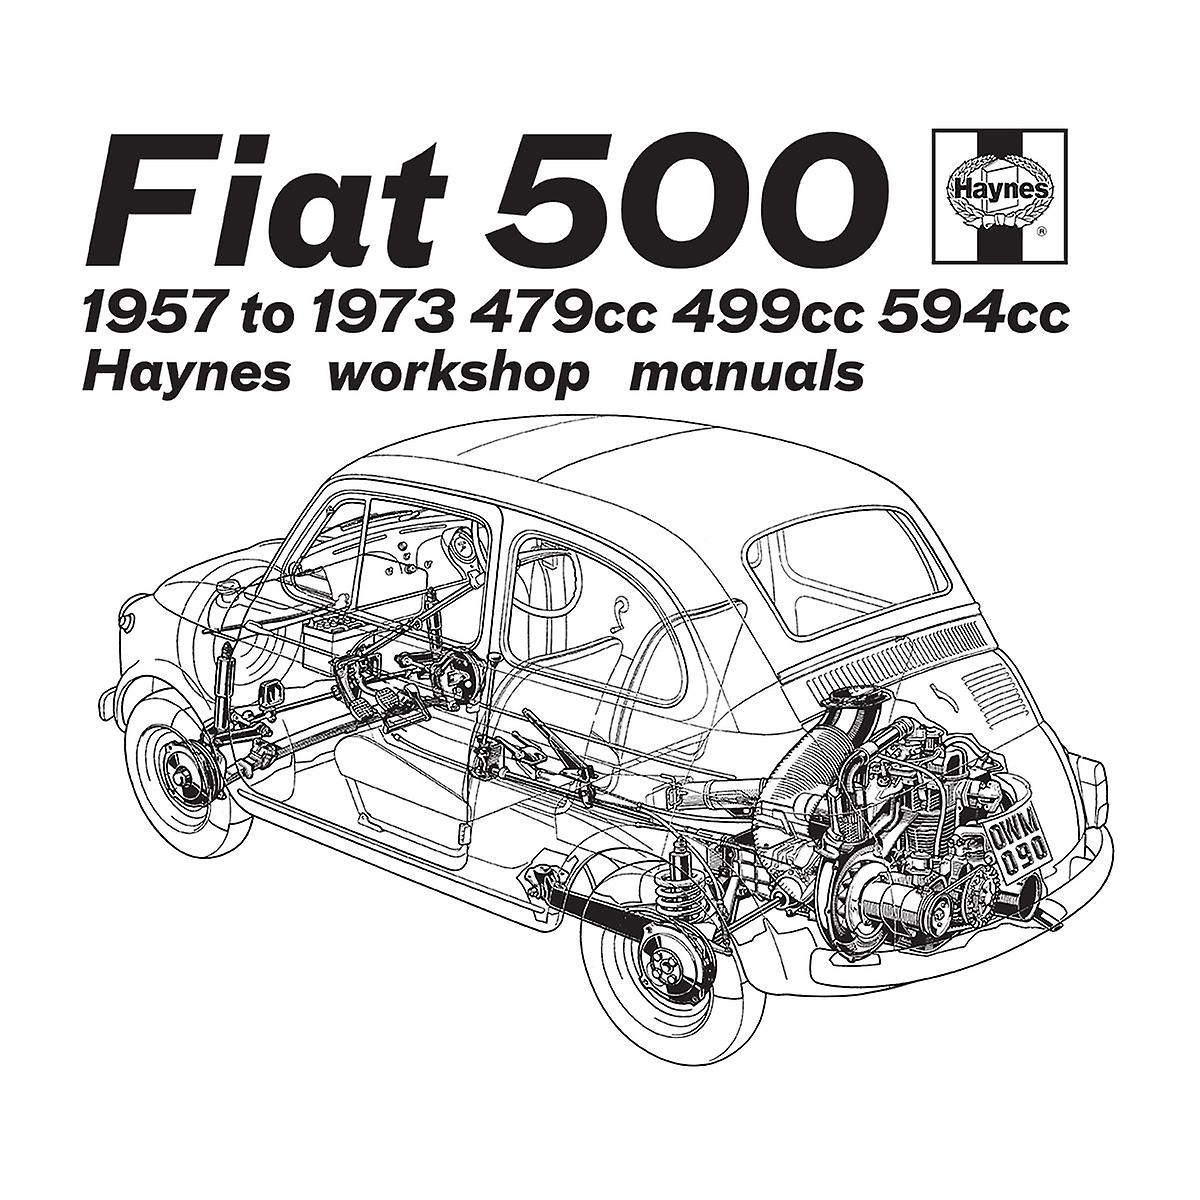 Haynes Workshop Manual Fiat 500 Black Men's Sweatshirt